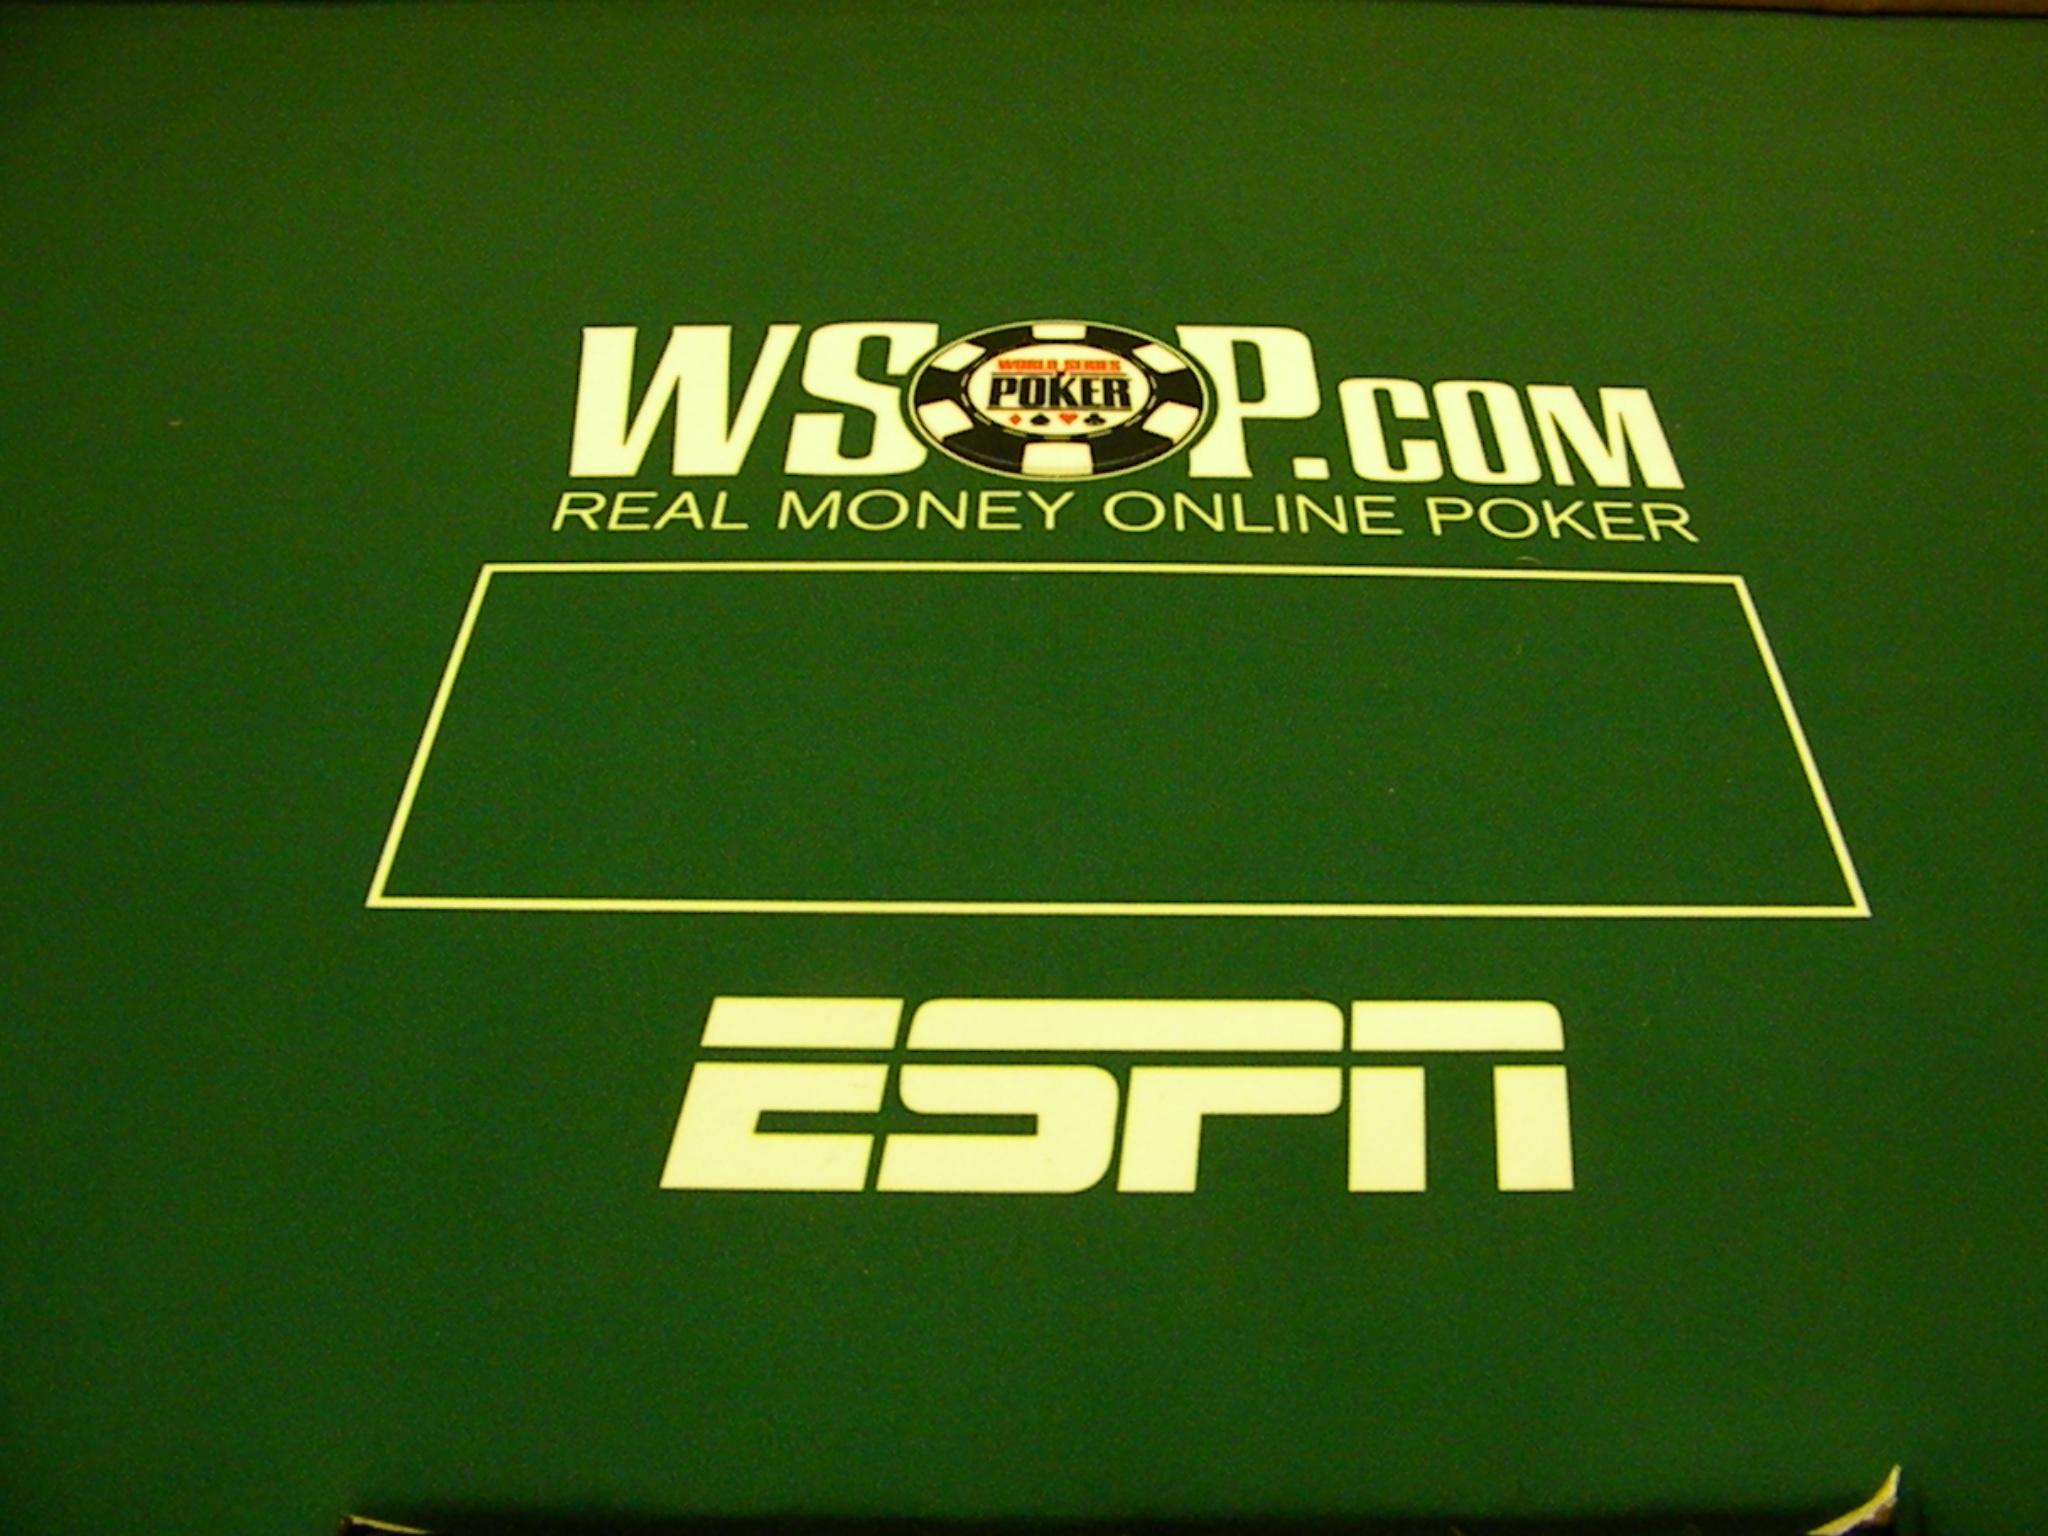 William Reymond WSOP.com win.